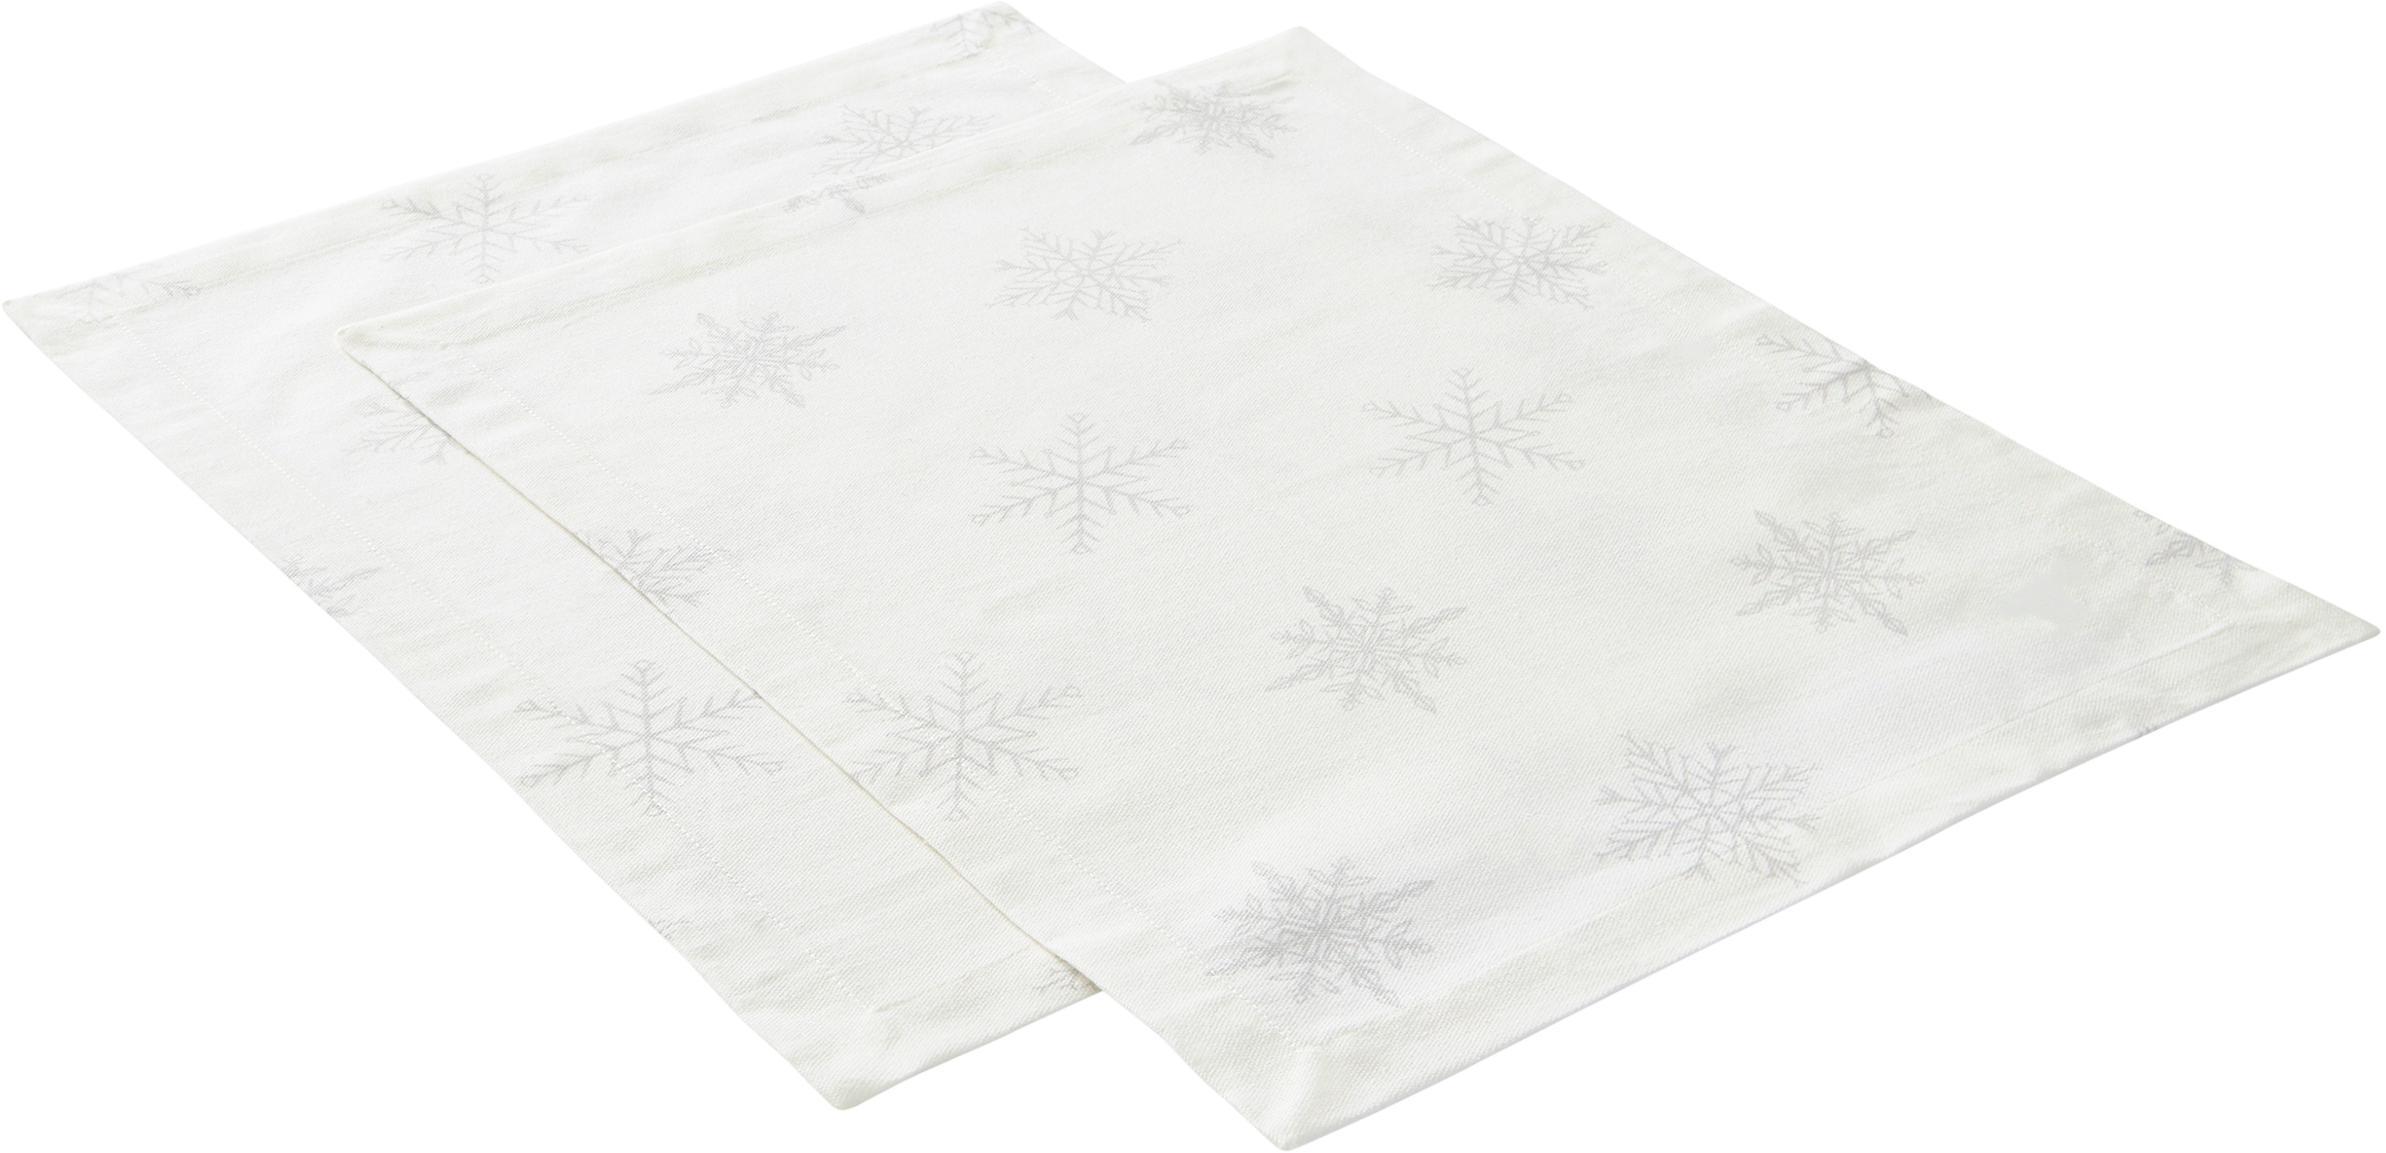 Placemats Snow, 2 stuks, 100% katoen, afkomstig van duurzame katoenteelt, Crèmewit, lichtgrijs, 35 x 45 cm